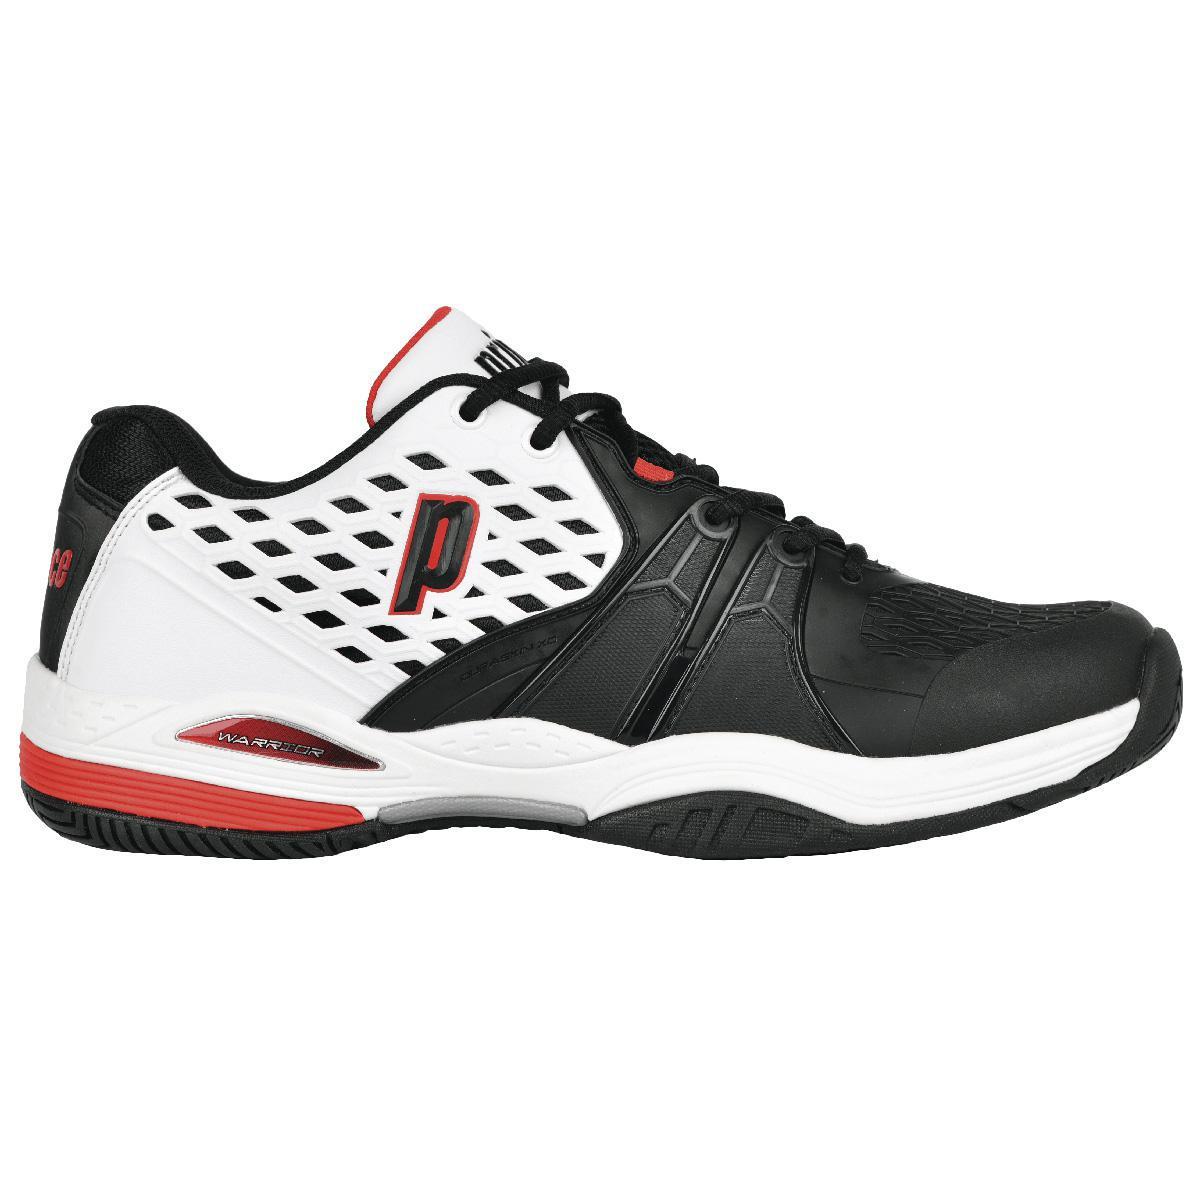 Prince Mens Warrior Tennis Shoes